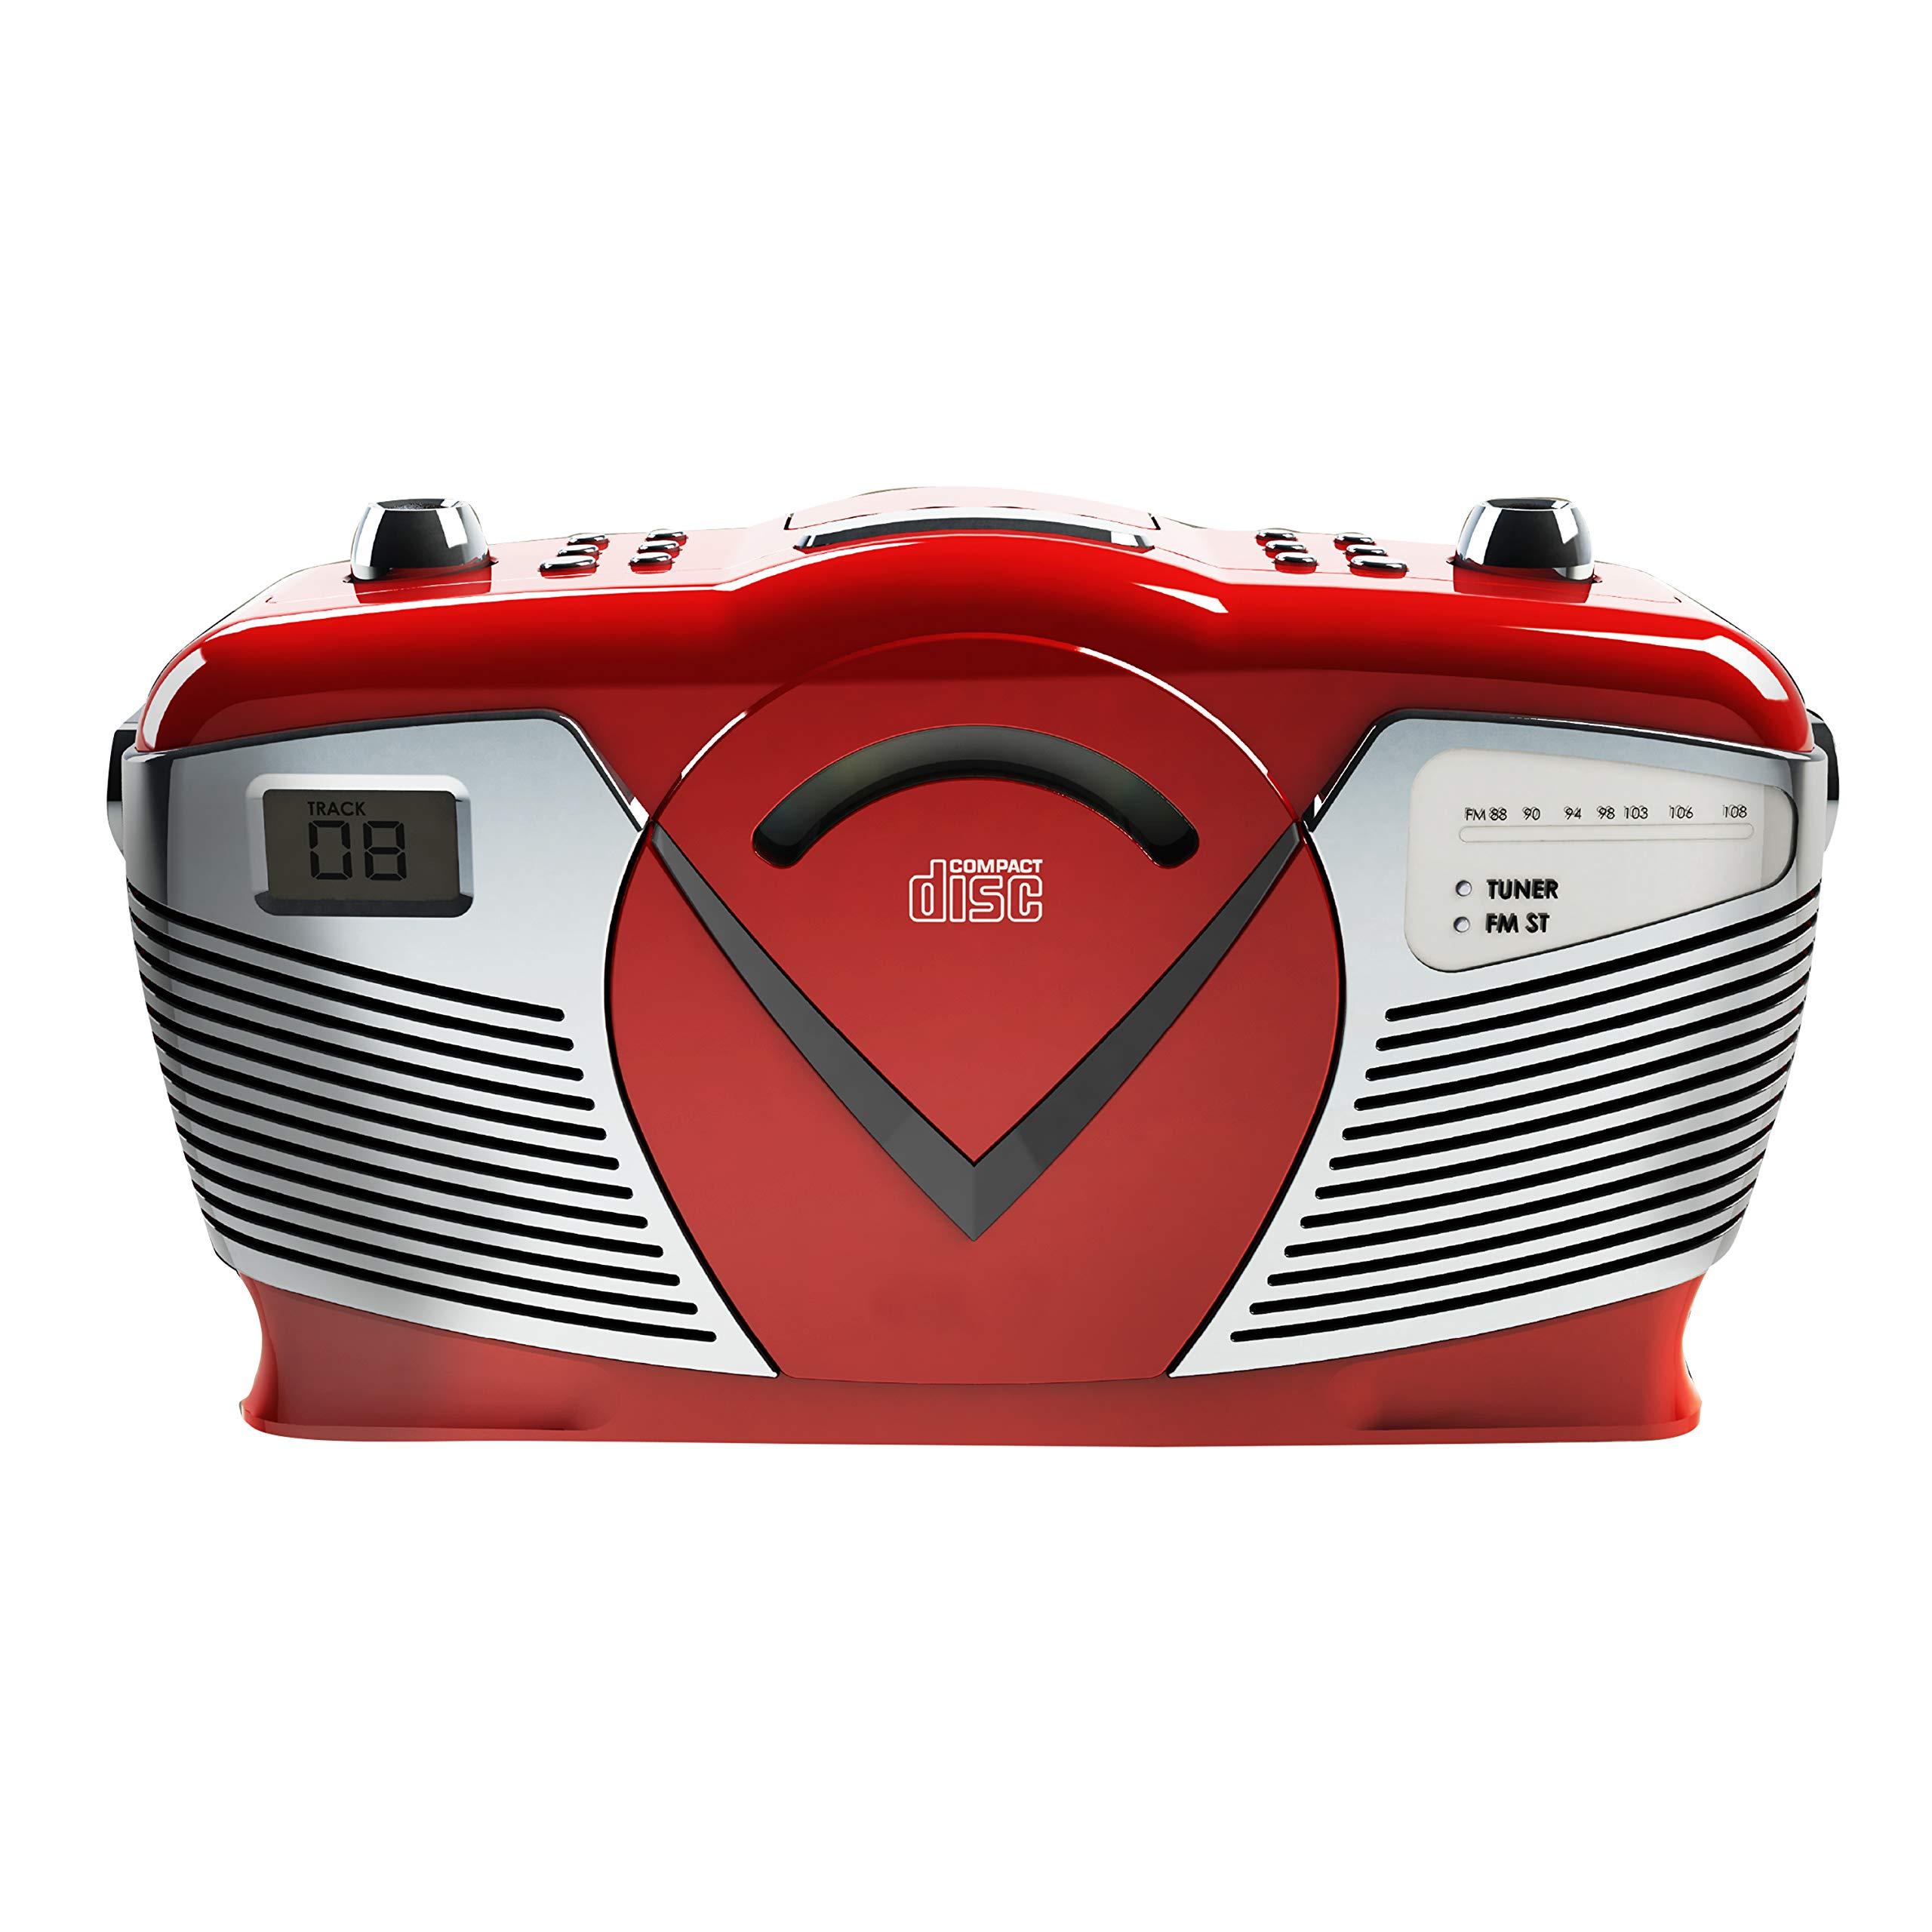 Sylvania Portable CD Boombox with AM/FM Radio, Retro Style, Red